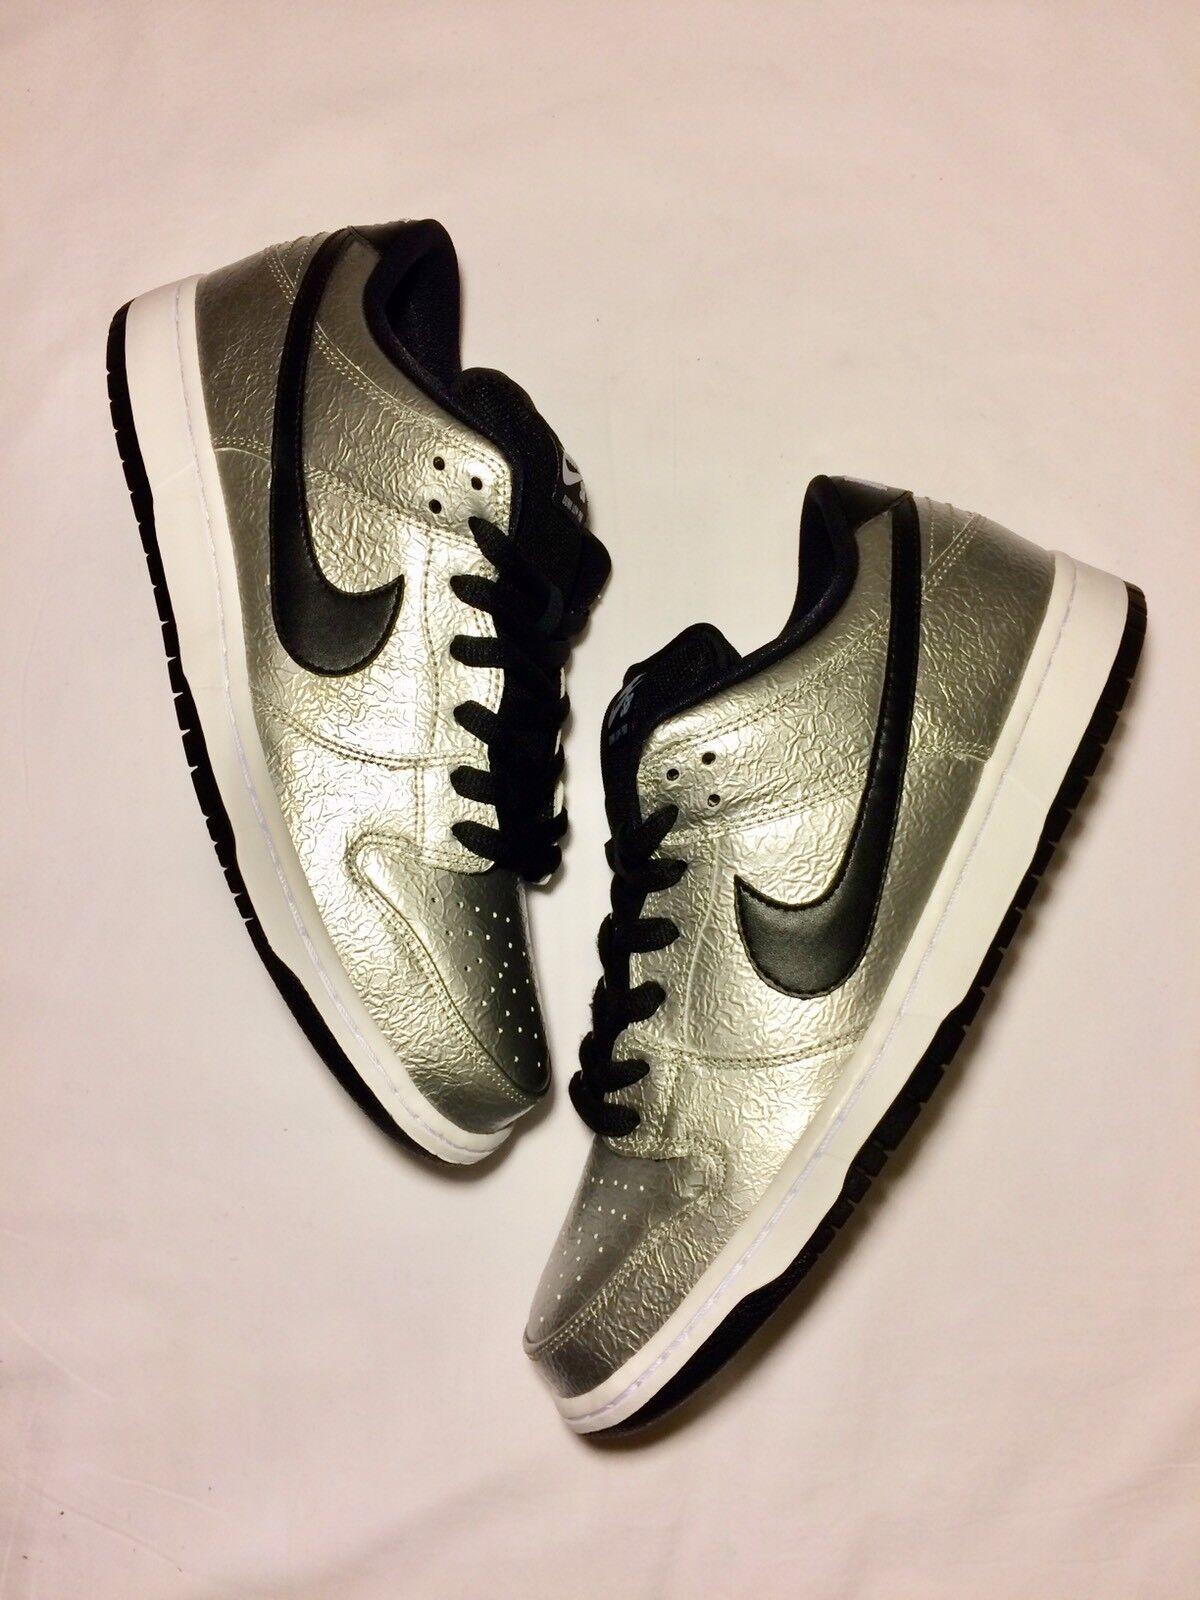 Nike Mens Dunk Low Premium SB Cold Pizza Silver Black 10 DS (313170-024)